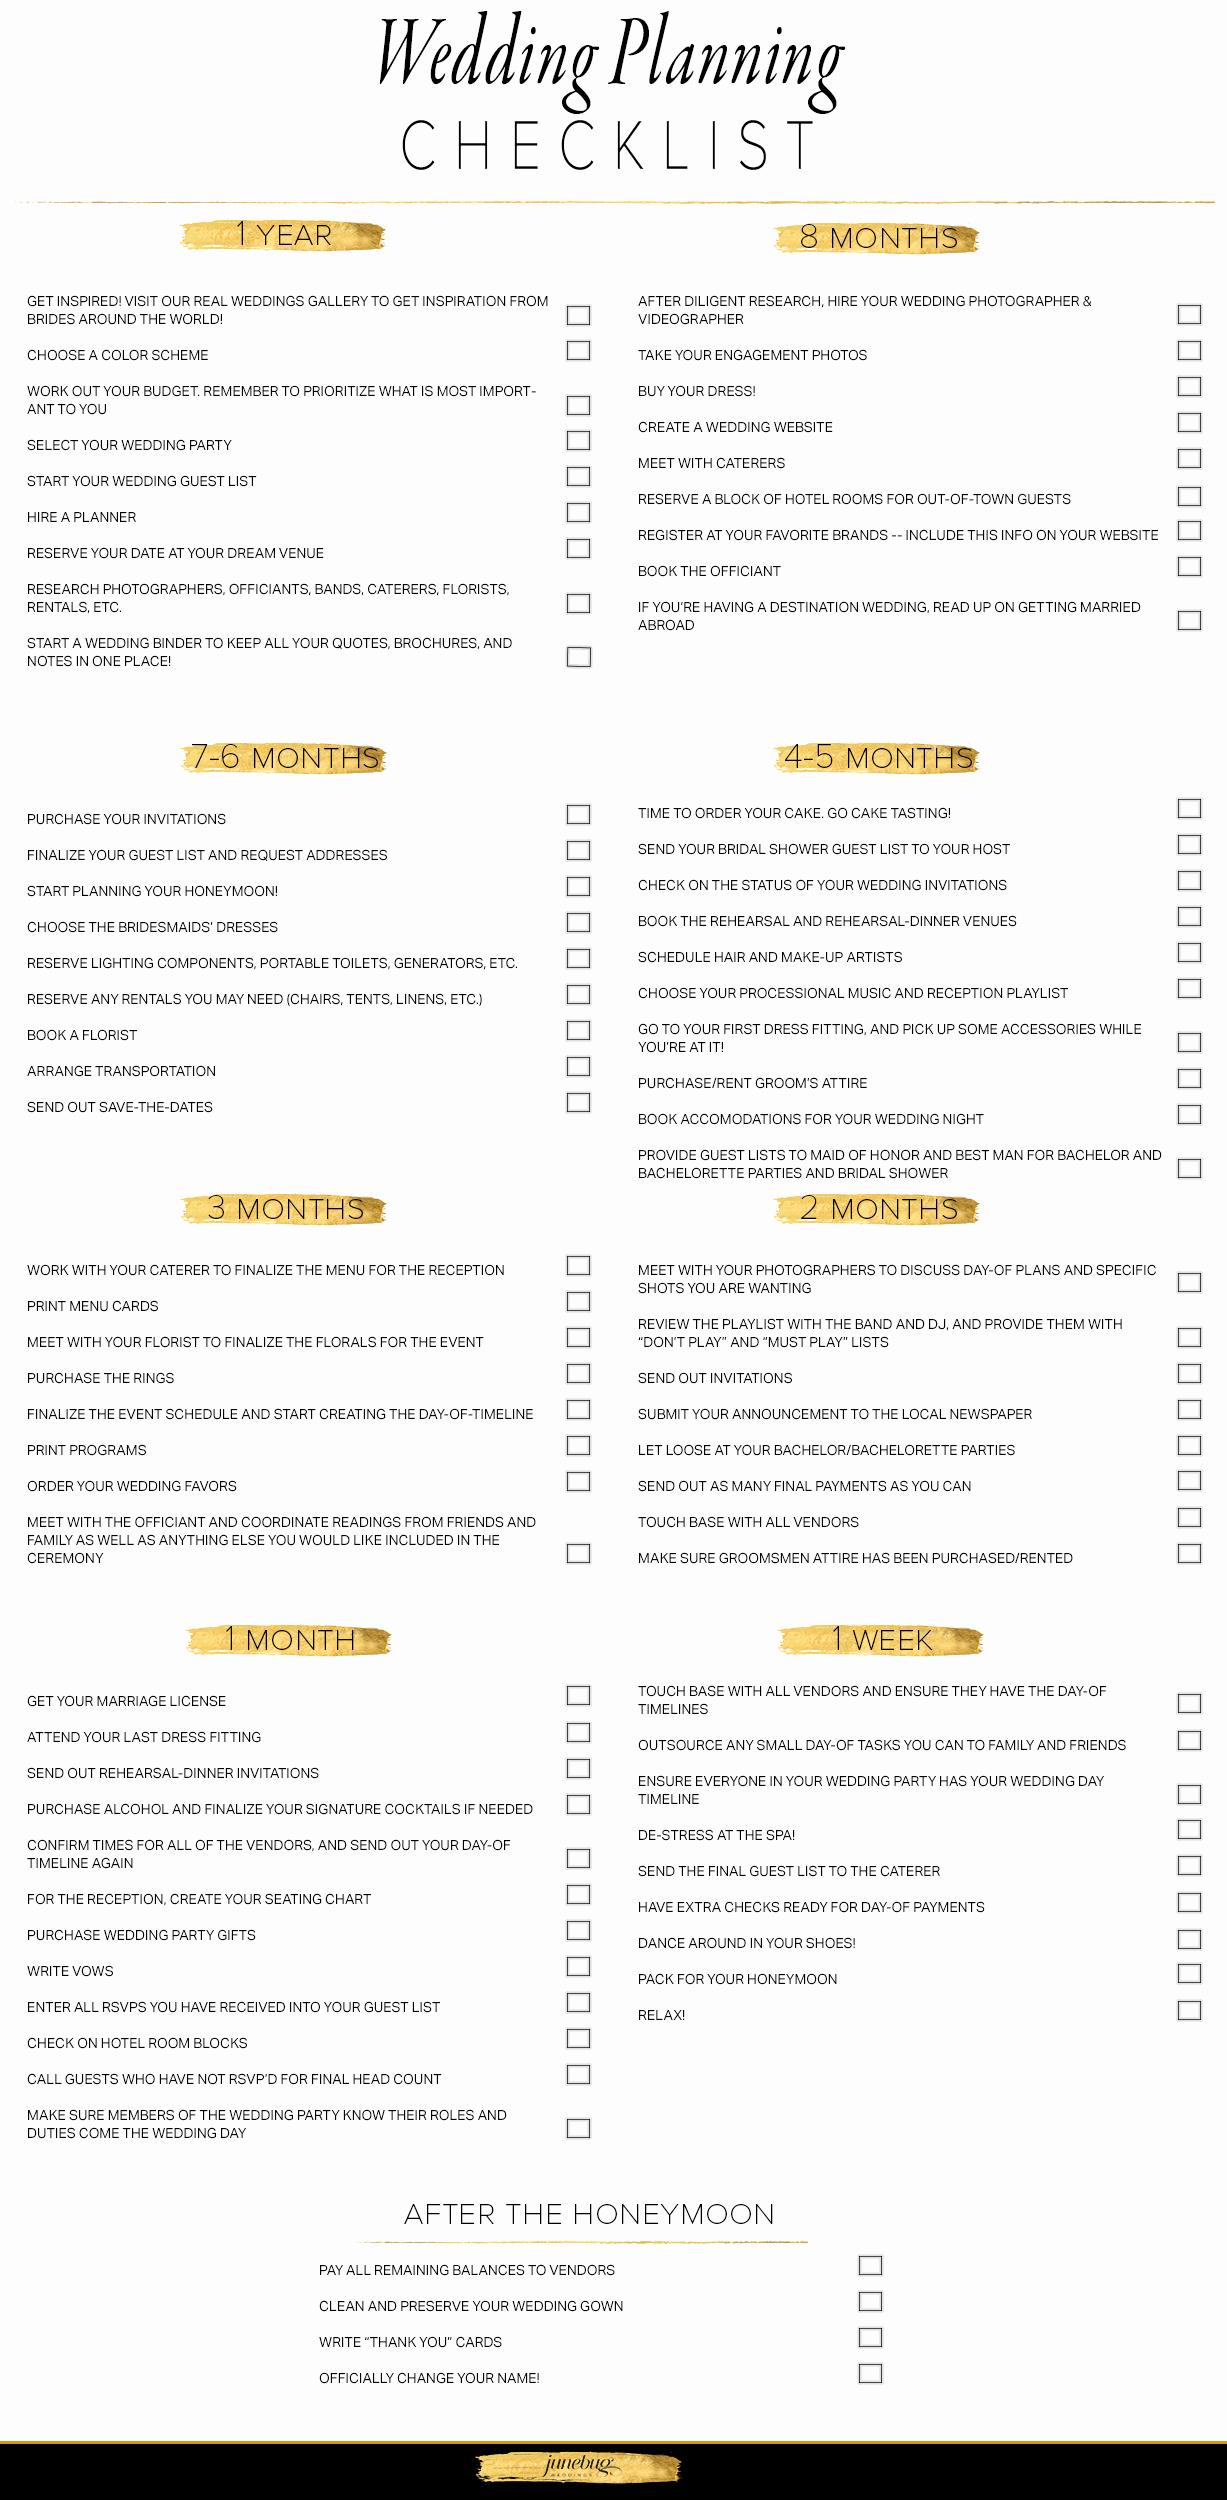 Free Printable Wedding Checklist Fresh Wedding Planning Checklist